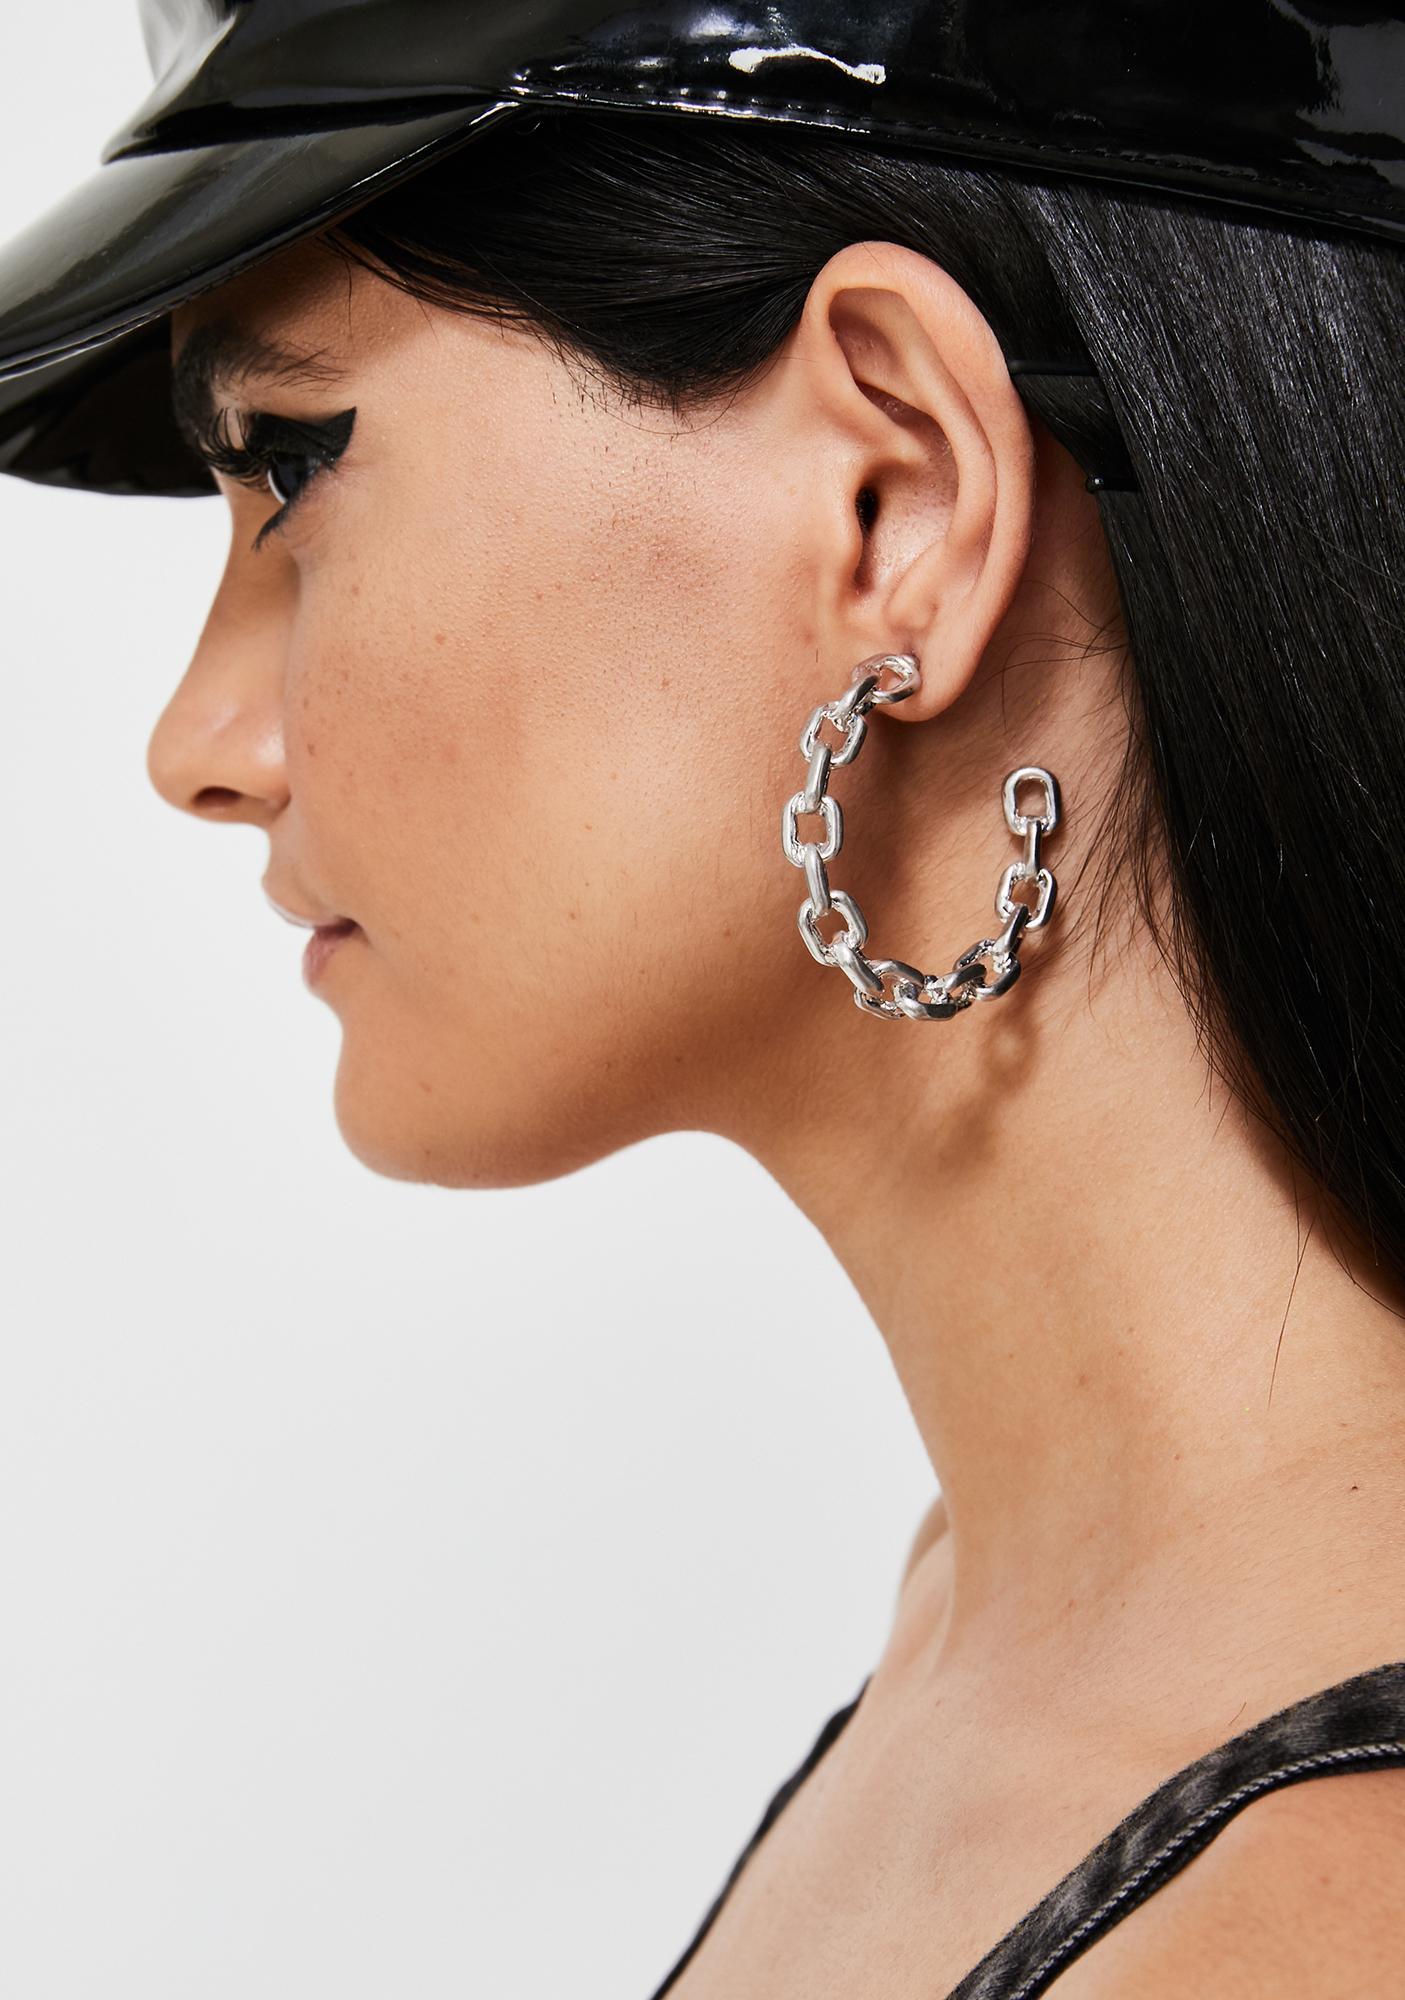 Chained Up Hoop Earrings